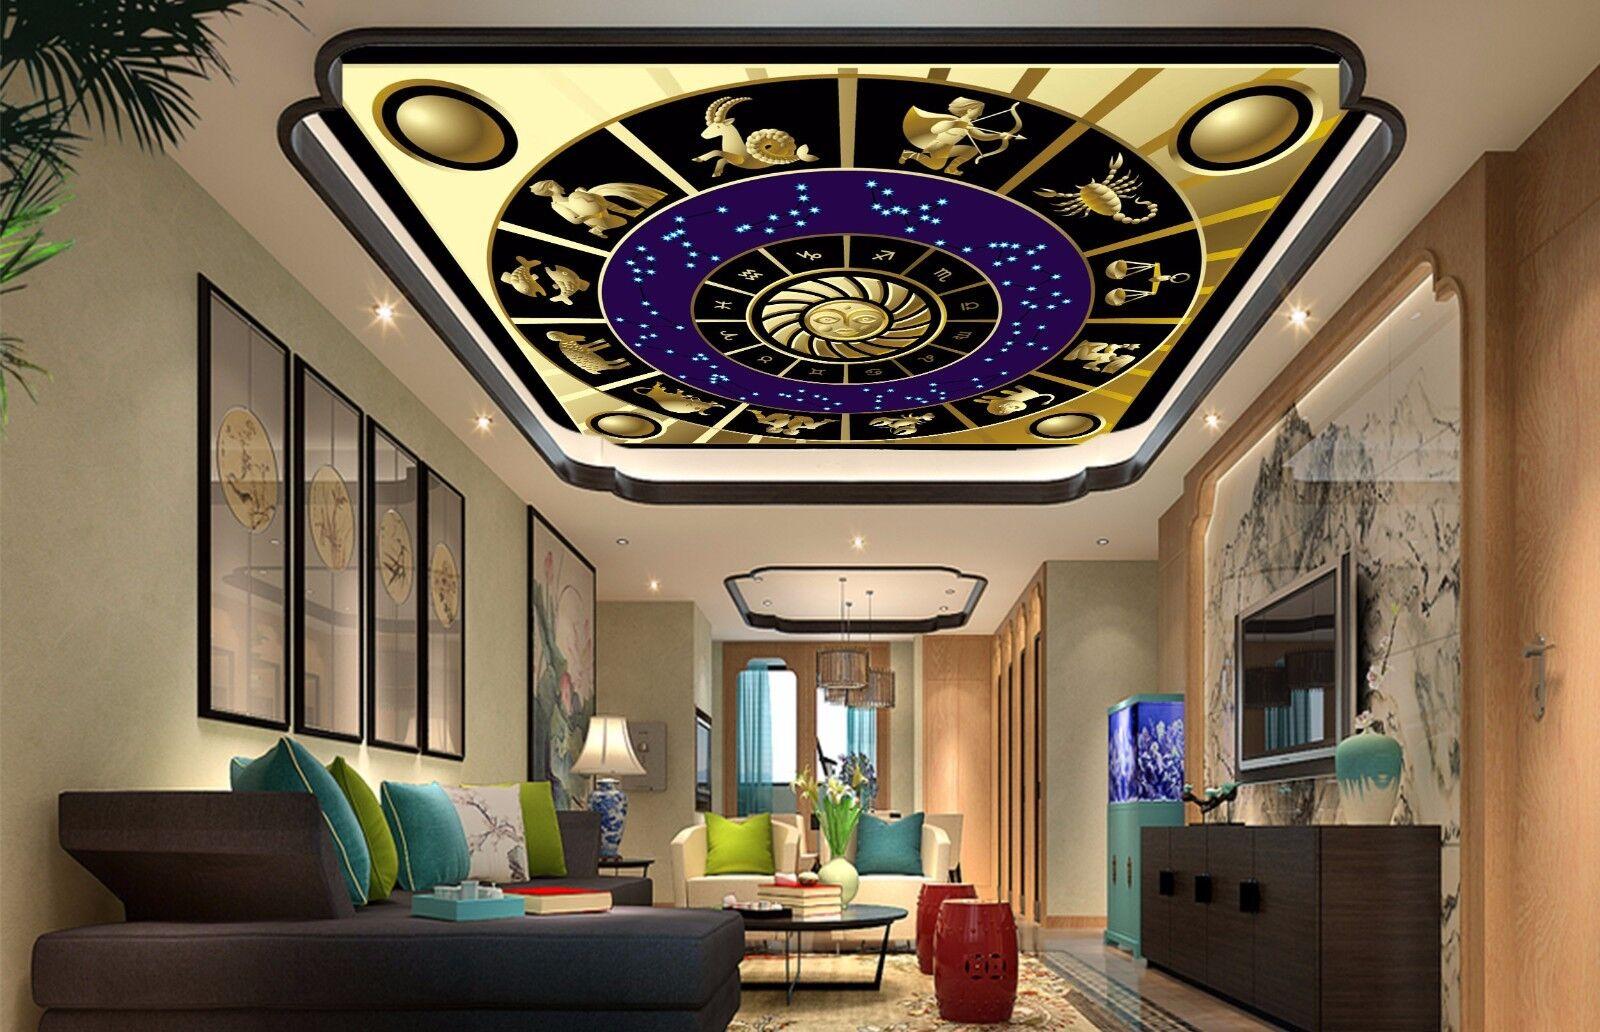 3D Astrology 665 Ceiling WallPaper Murals Wall Print Decal Deco AJ WALLPAPER UK